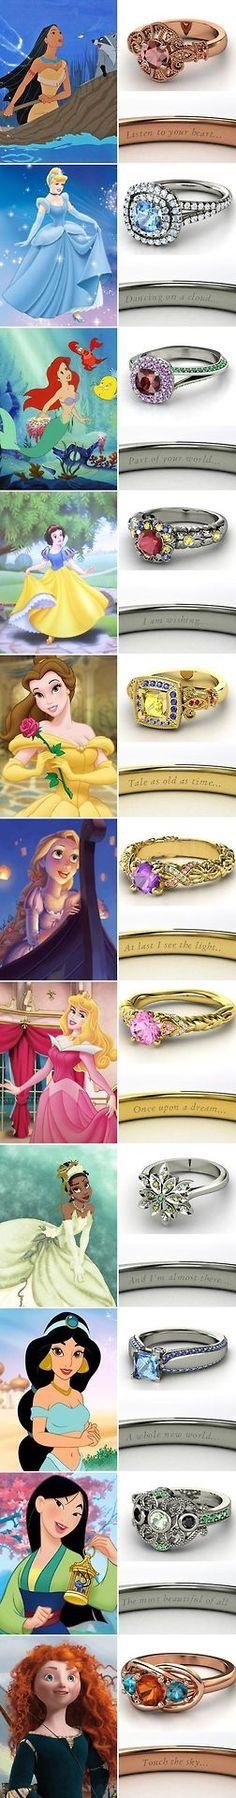 Disney princess wedding rings and more ideas for diehard #DisneyPrincess fans!